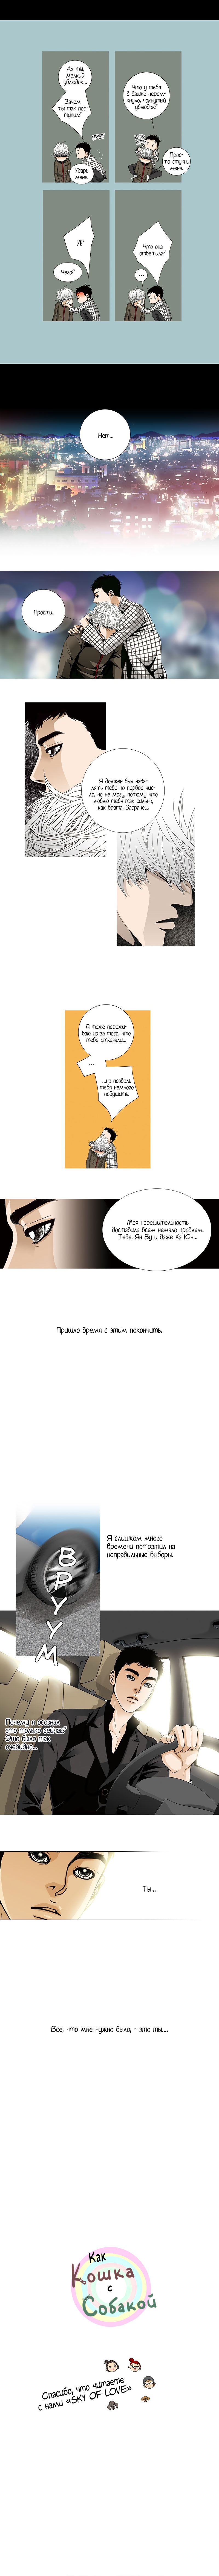 https://r1.ninemanga.com/comics/pic2/29/28573/344349/1512079096206.jpg Page 5